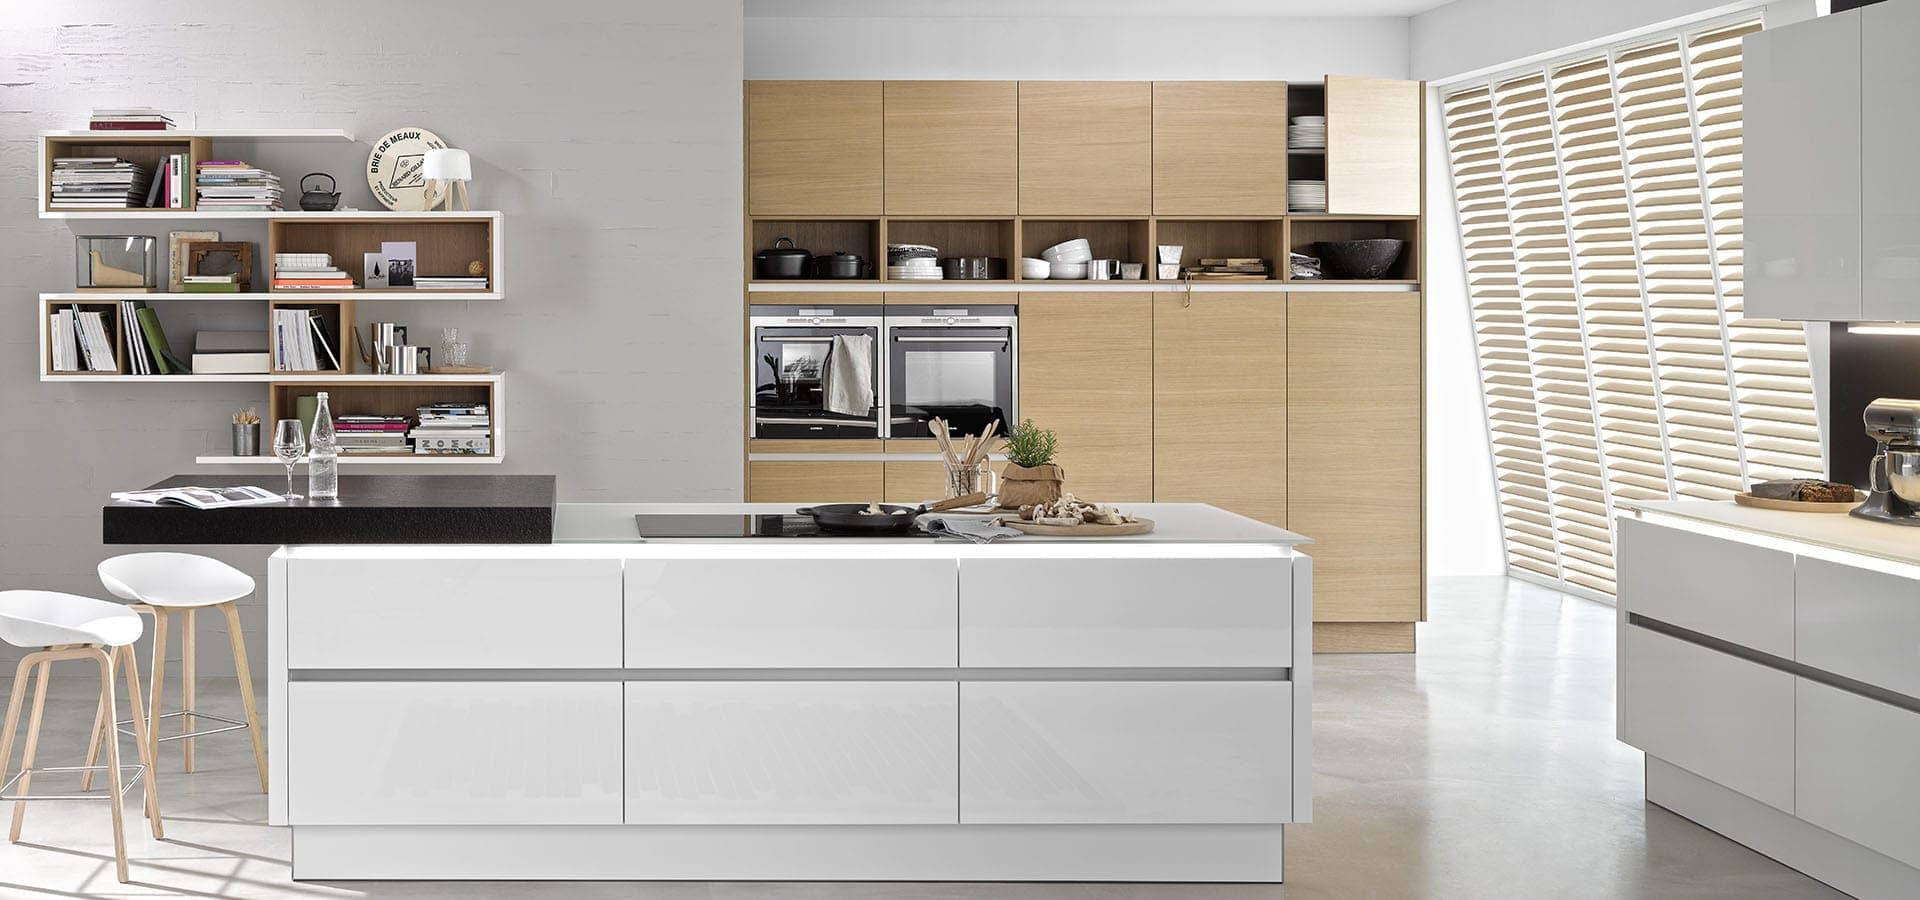 kuchnie na wymiar meble bogaccy ostr w wielkopolski. Black Bedroom Furniture Sets. Home Design Ideas